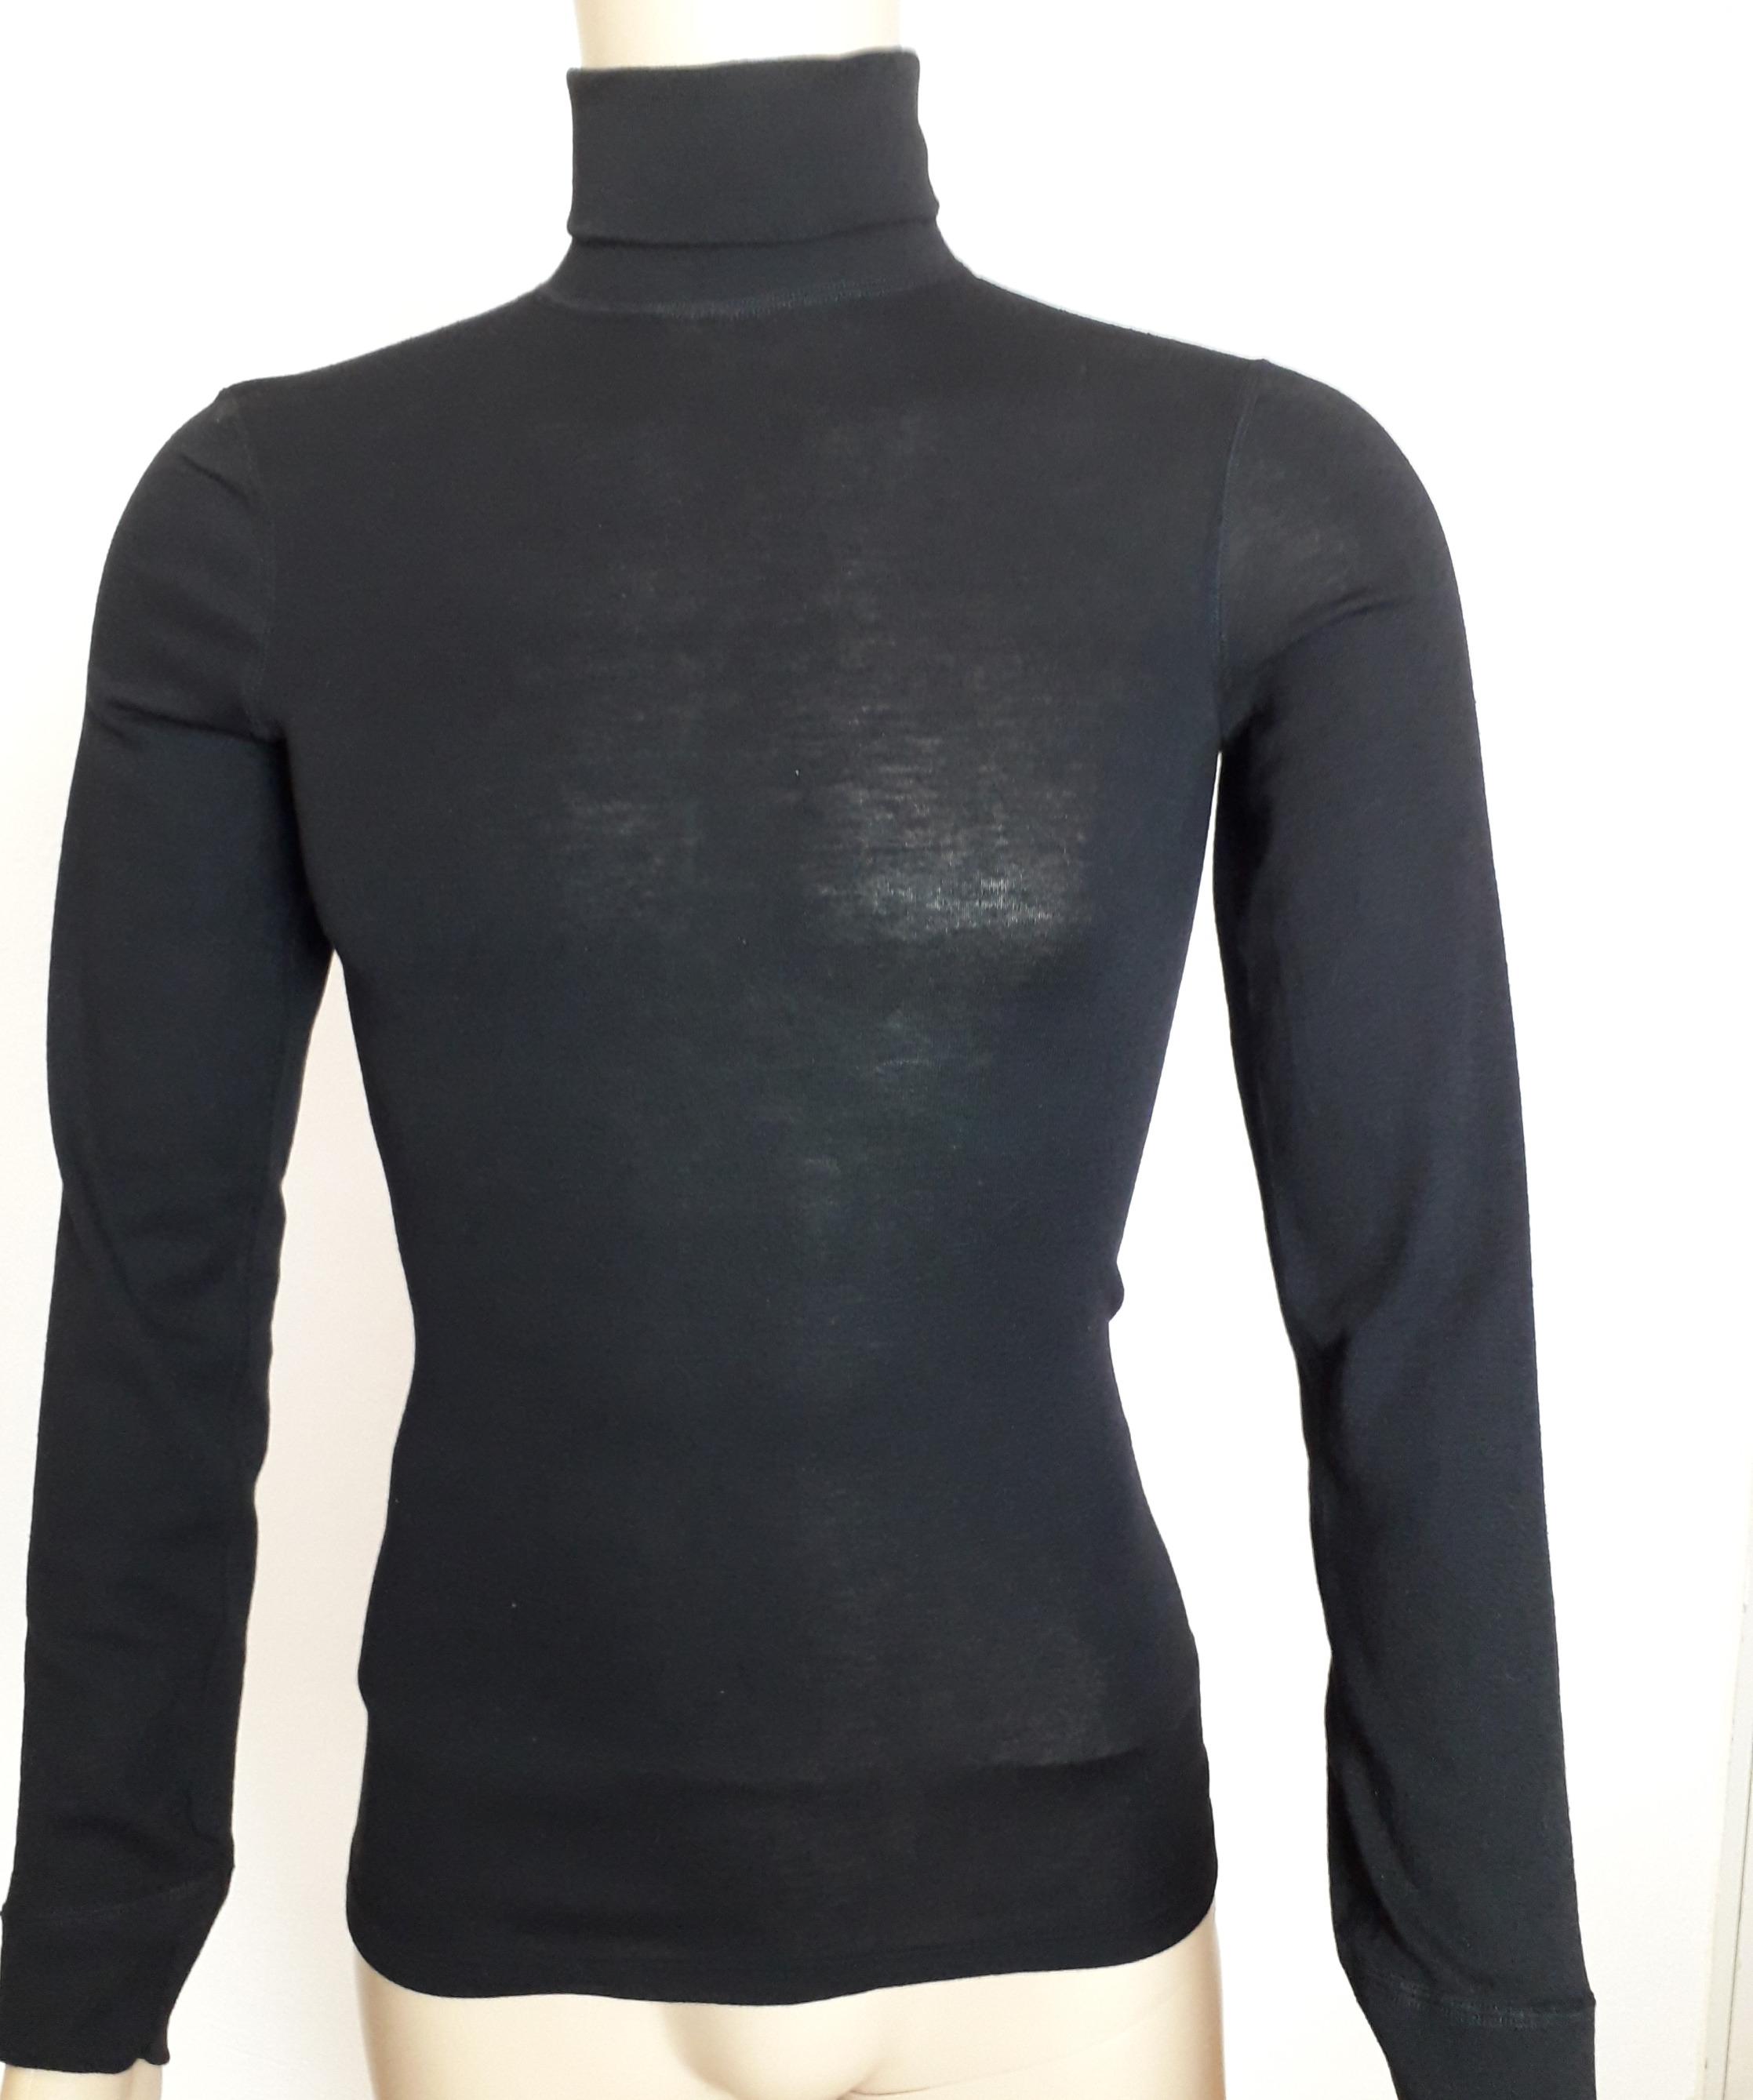 "Unisex Rollkragen - Shirt ""Sven"""